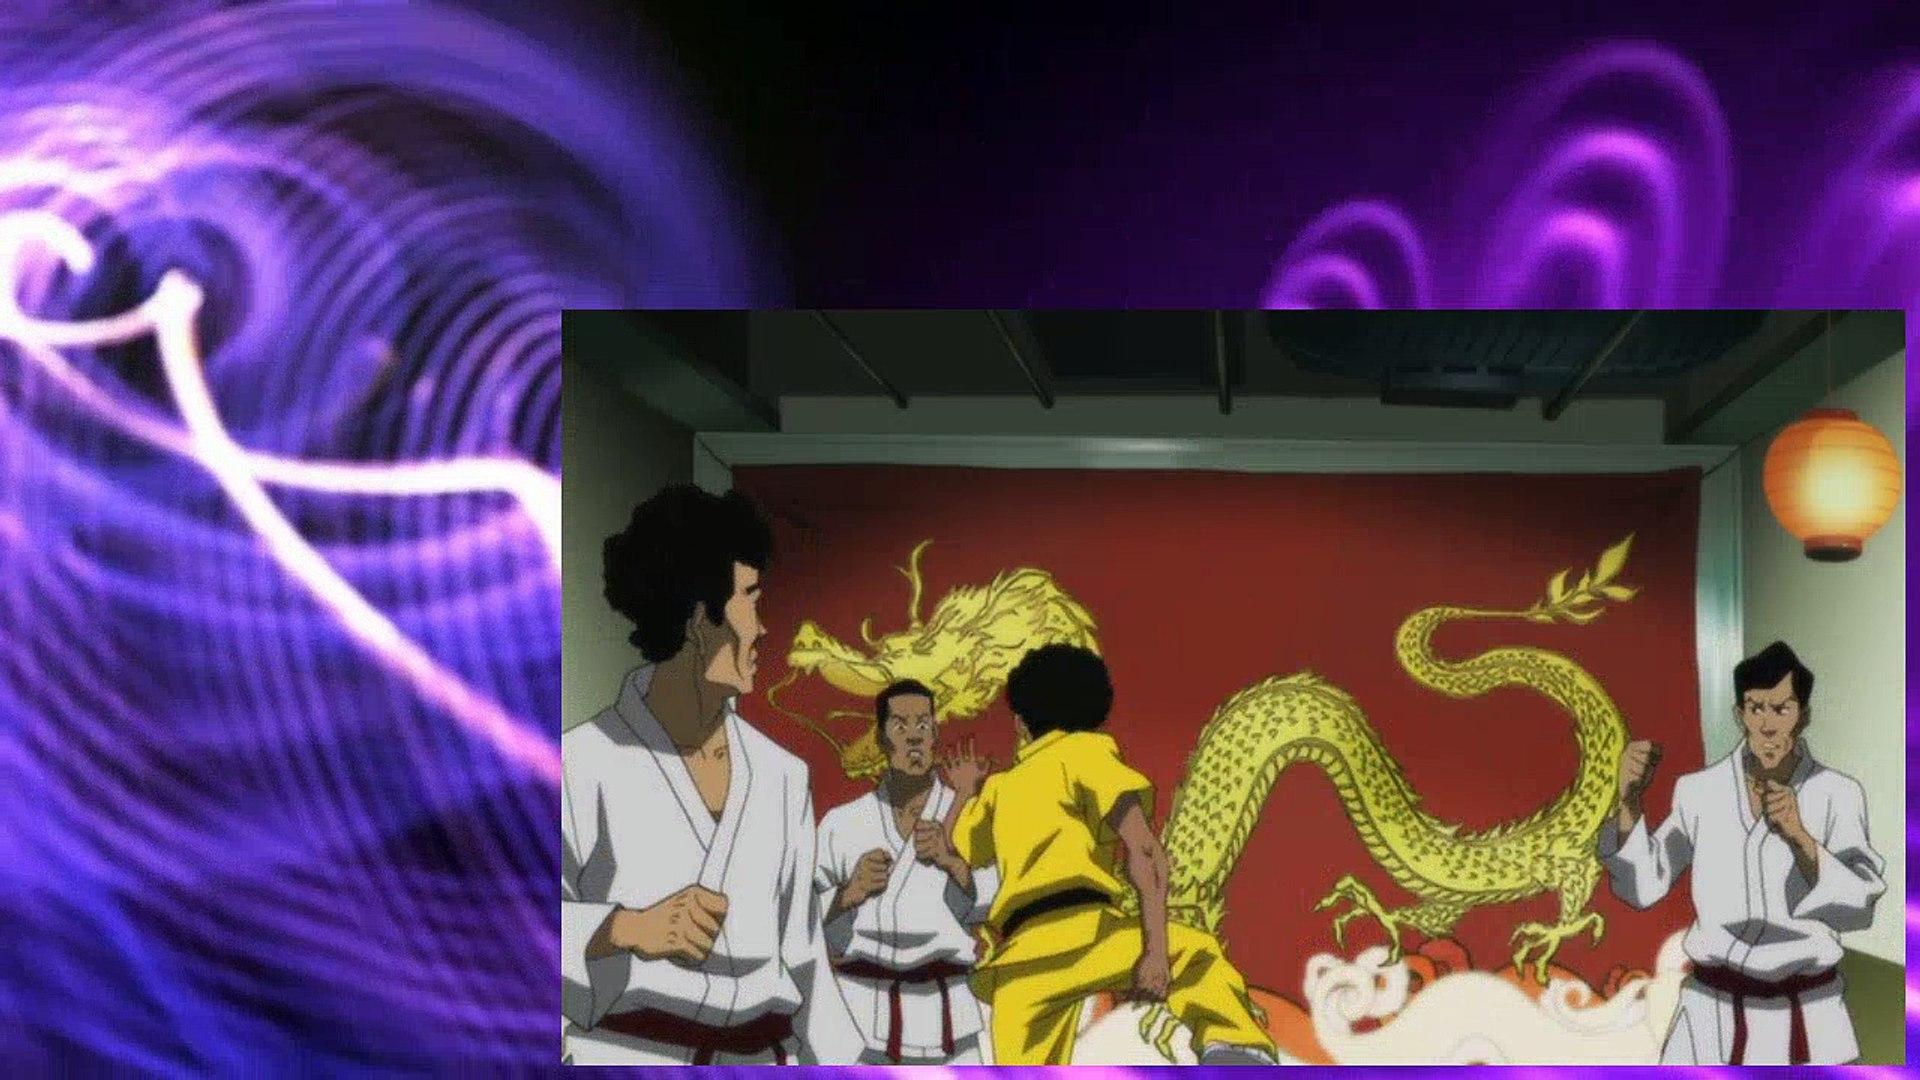 The Boondocks S03E08